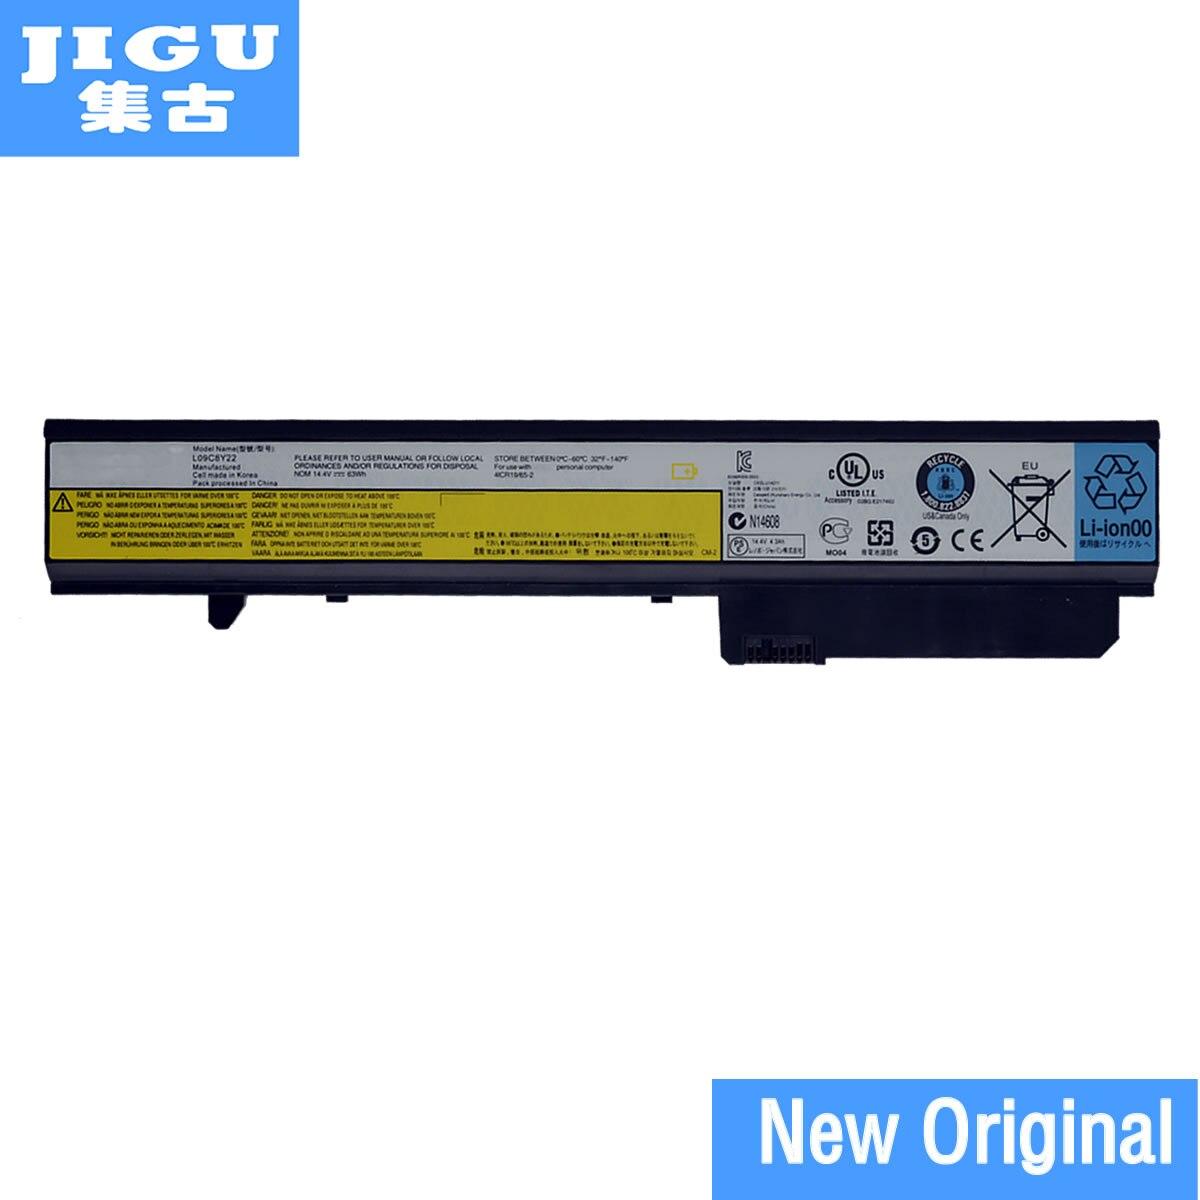 JIGU L09N8T22 L09N8Y22 L09P8Y22 LO9P8Y22 Original laptop Battery For Lenovo for IdeaPad U460 14.4V 64WH jigu l09n8t22 l09n8y22 l09p8y22 lo9p8y22 original laptop battery for lenovo ideapad u460 14 4v 64wh